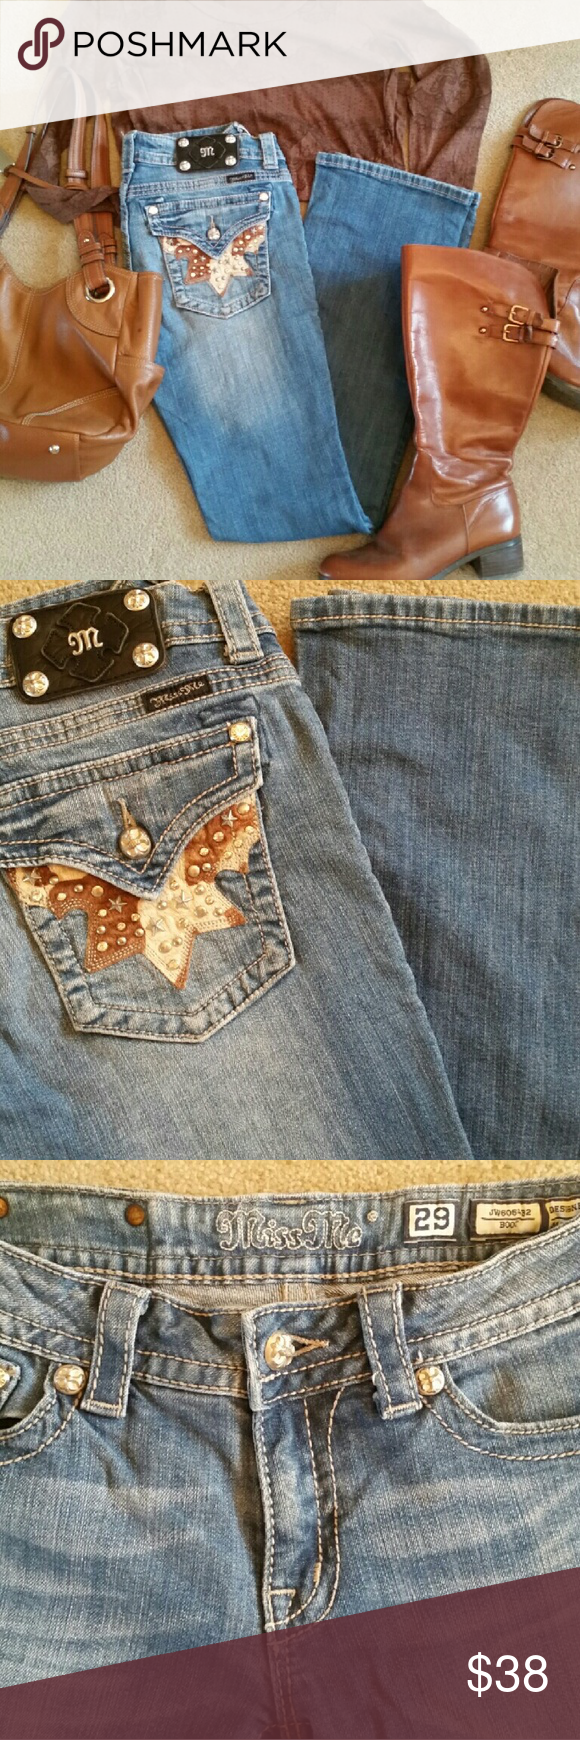 Miss Me Boot cut Jeans 29 x 33 Very cute comfy flap pocket Miss Me  Jeans Boot Cut